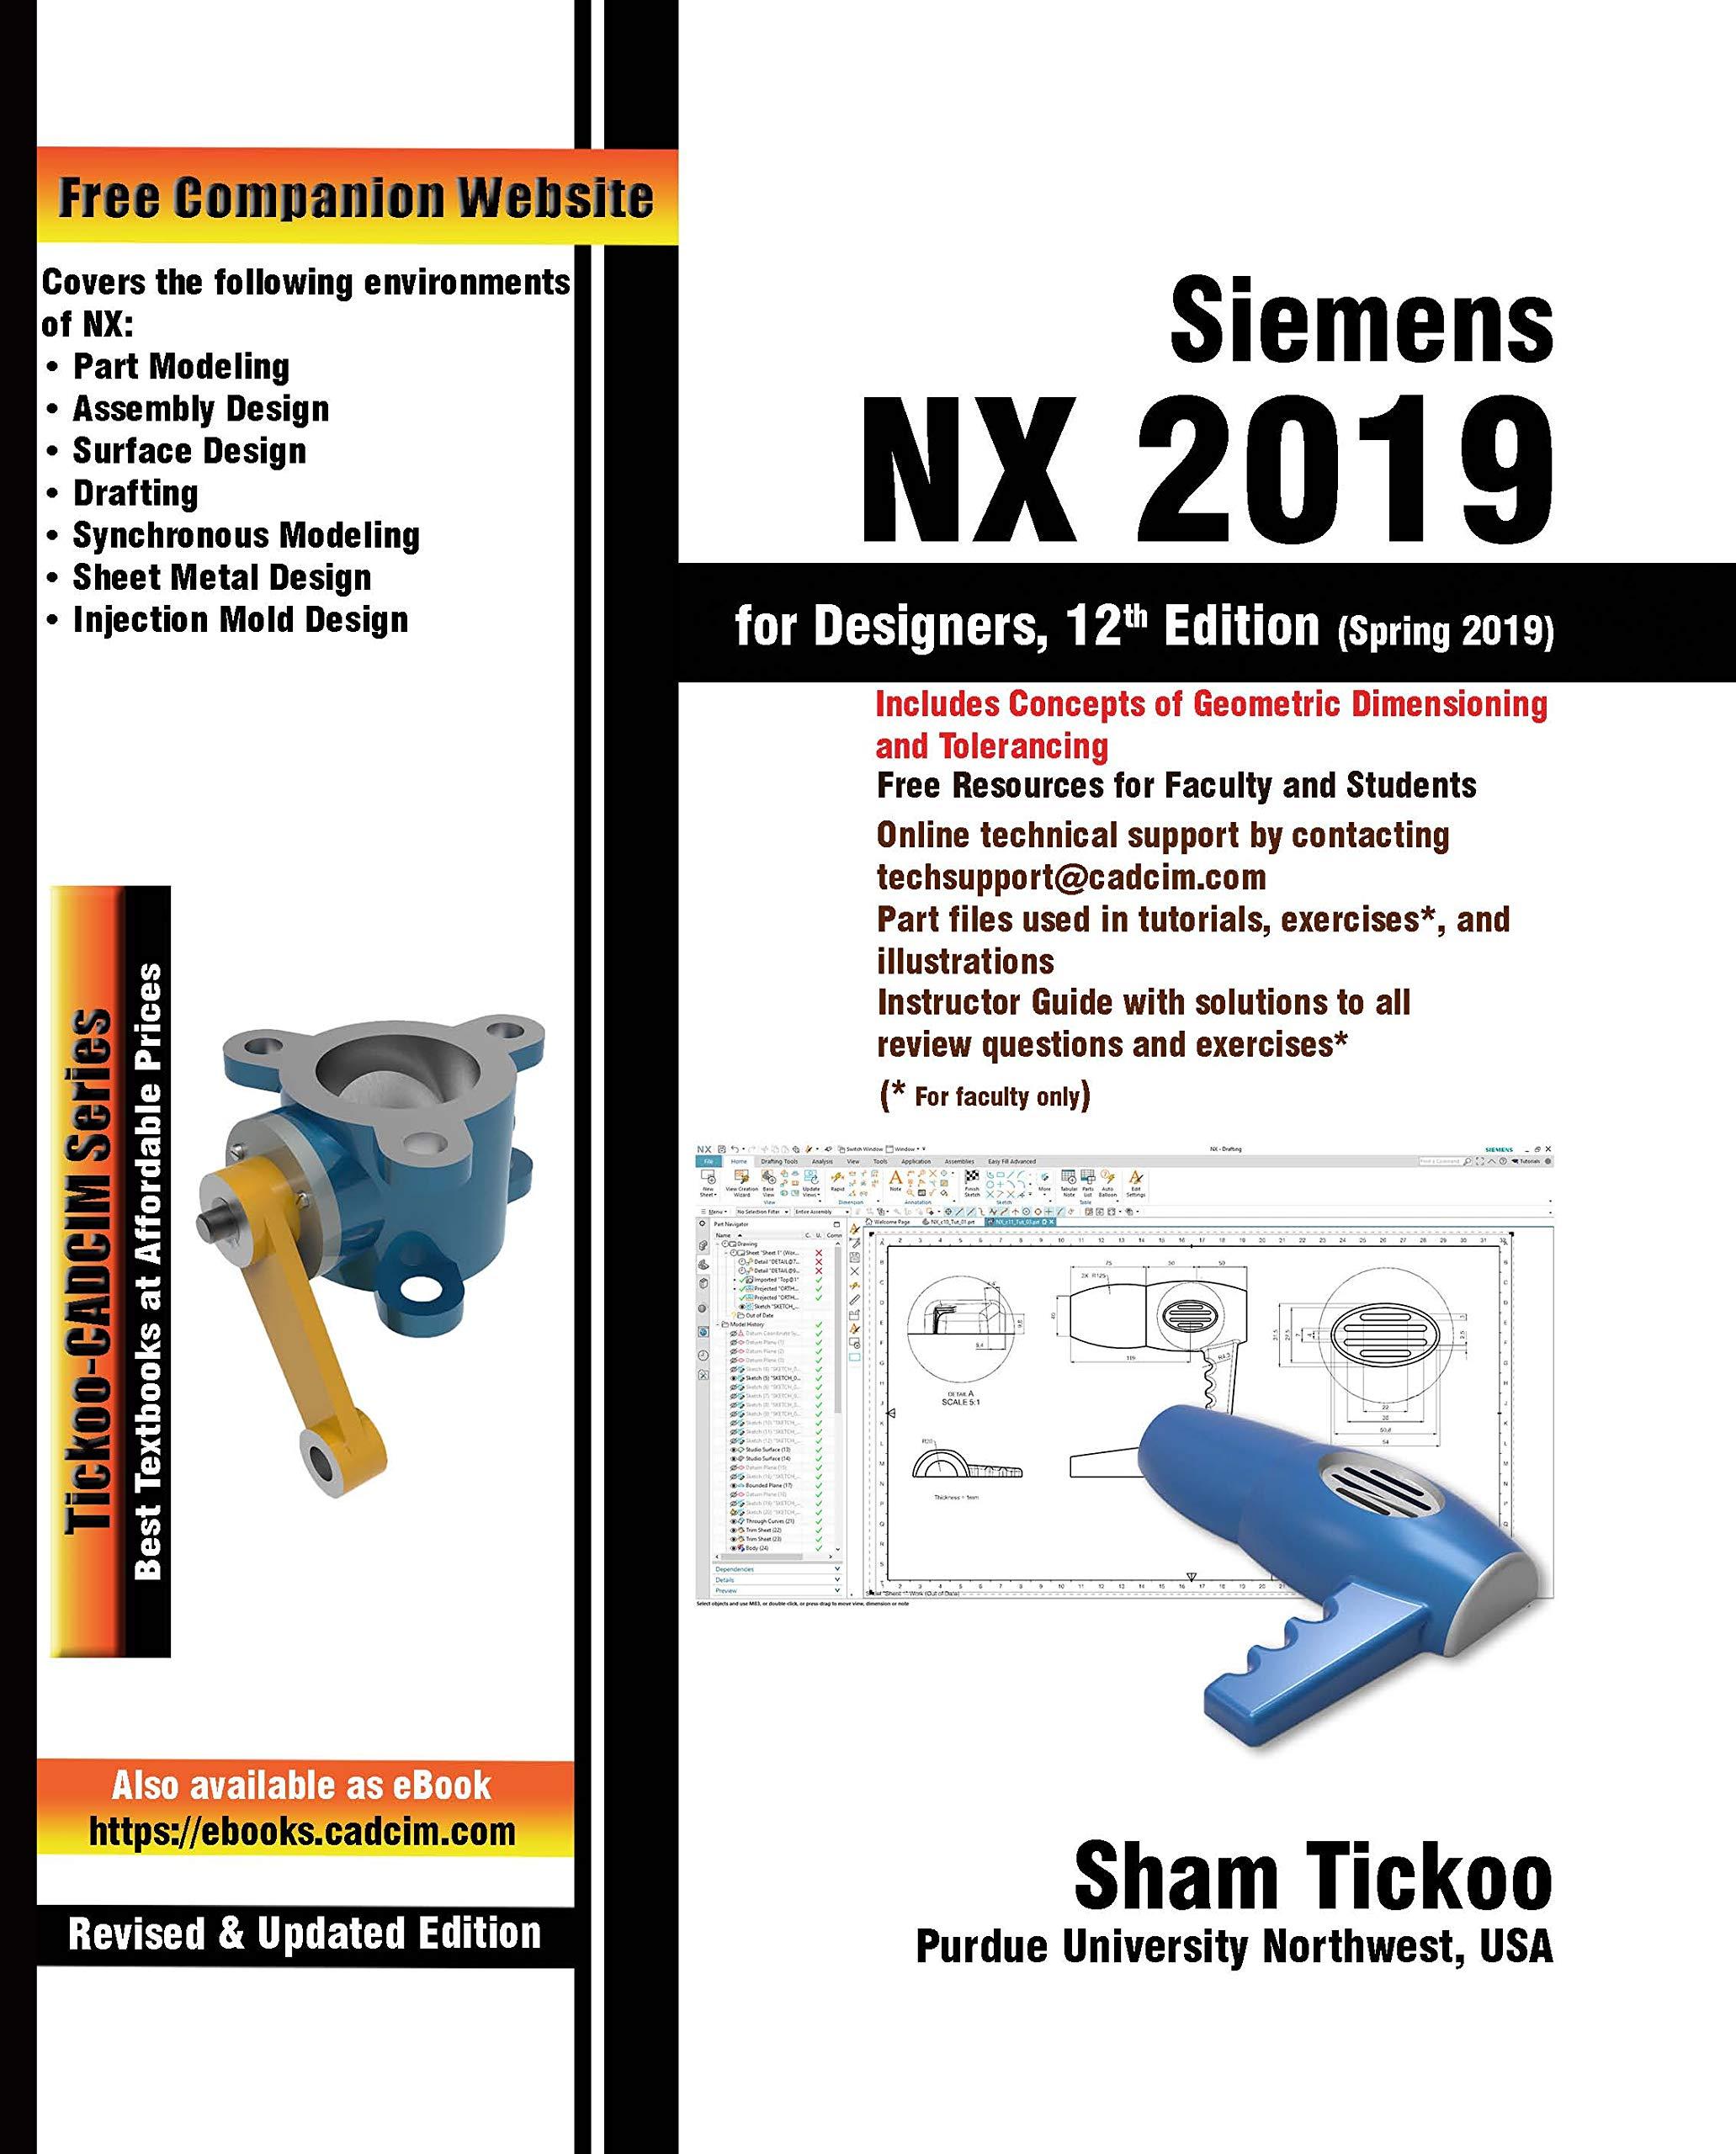 Siemens NX 2019 for Designers, 12th Edition: Prof  Sham